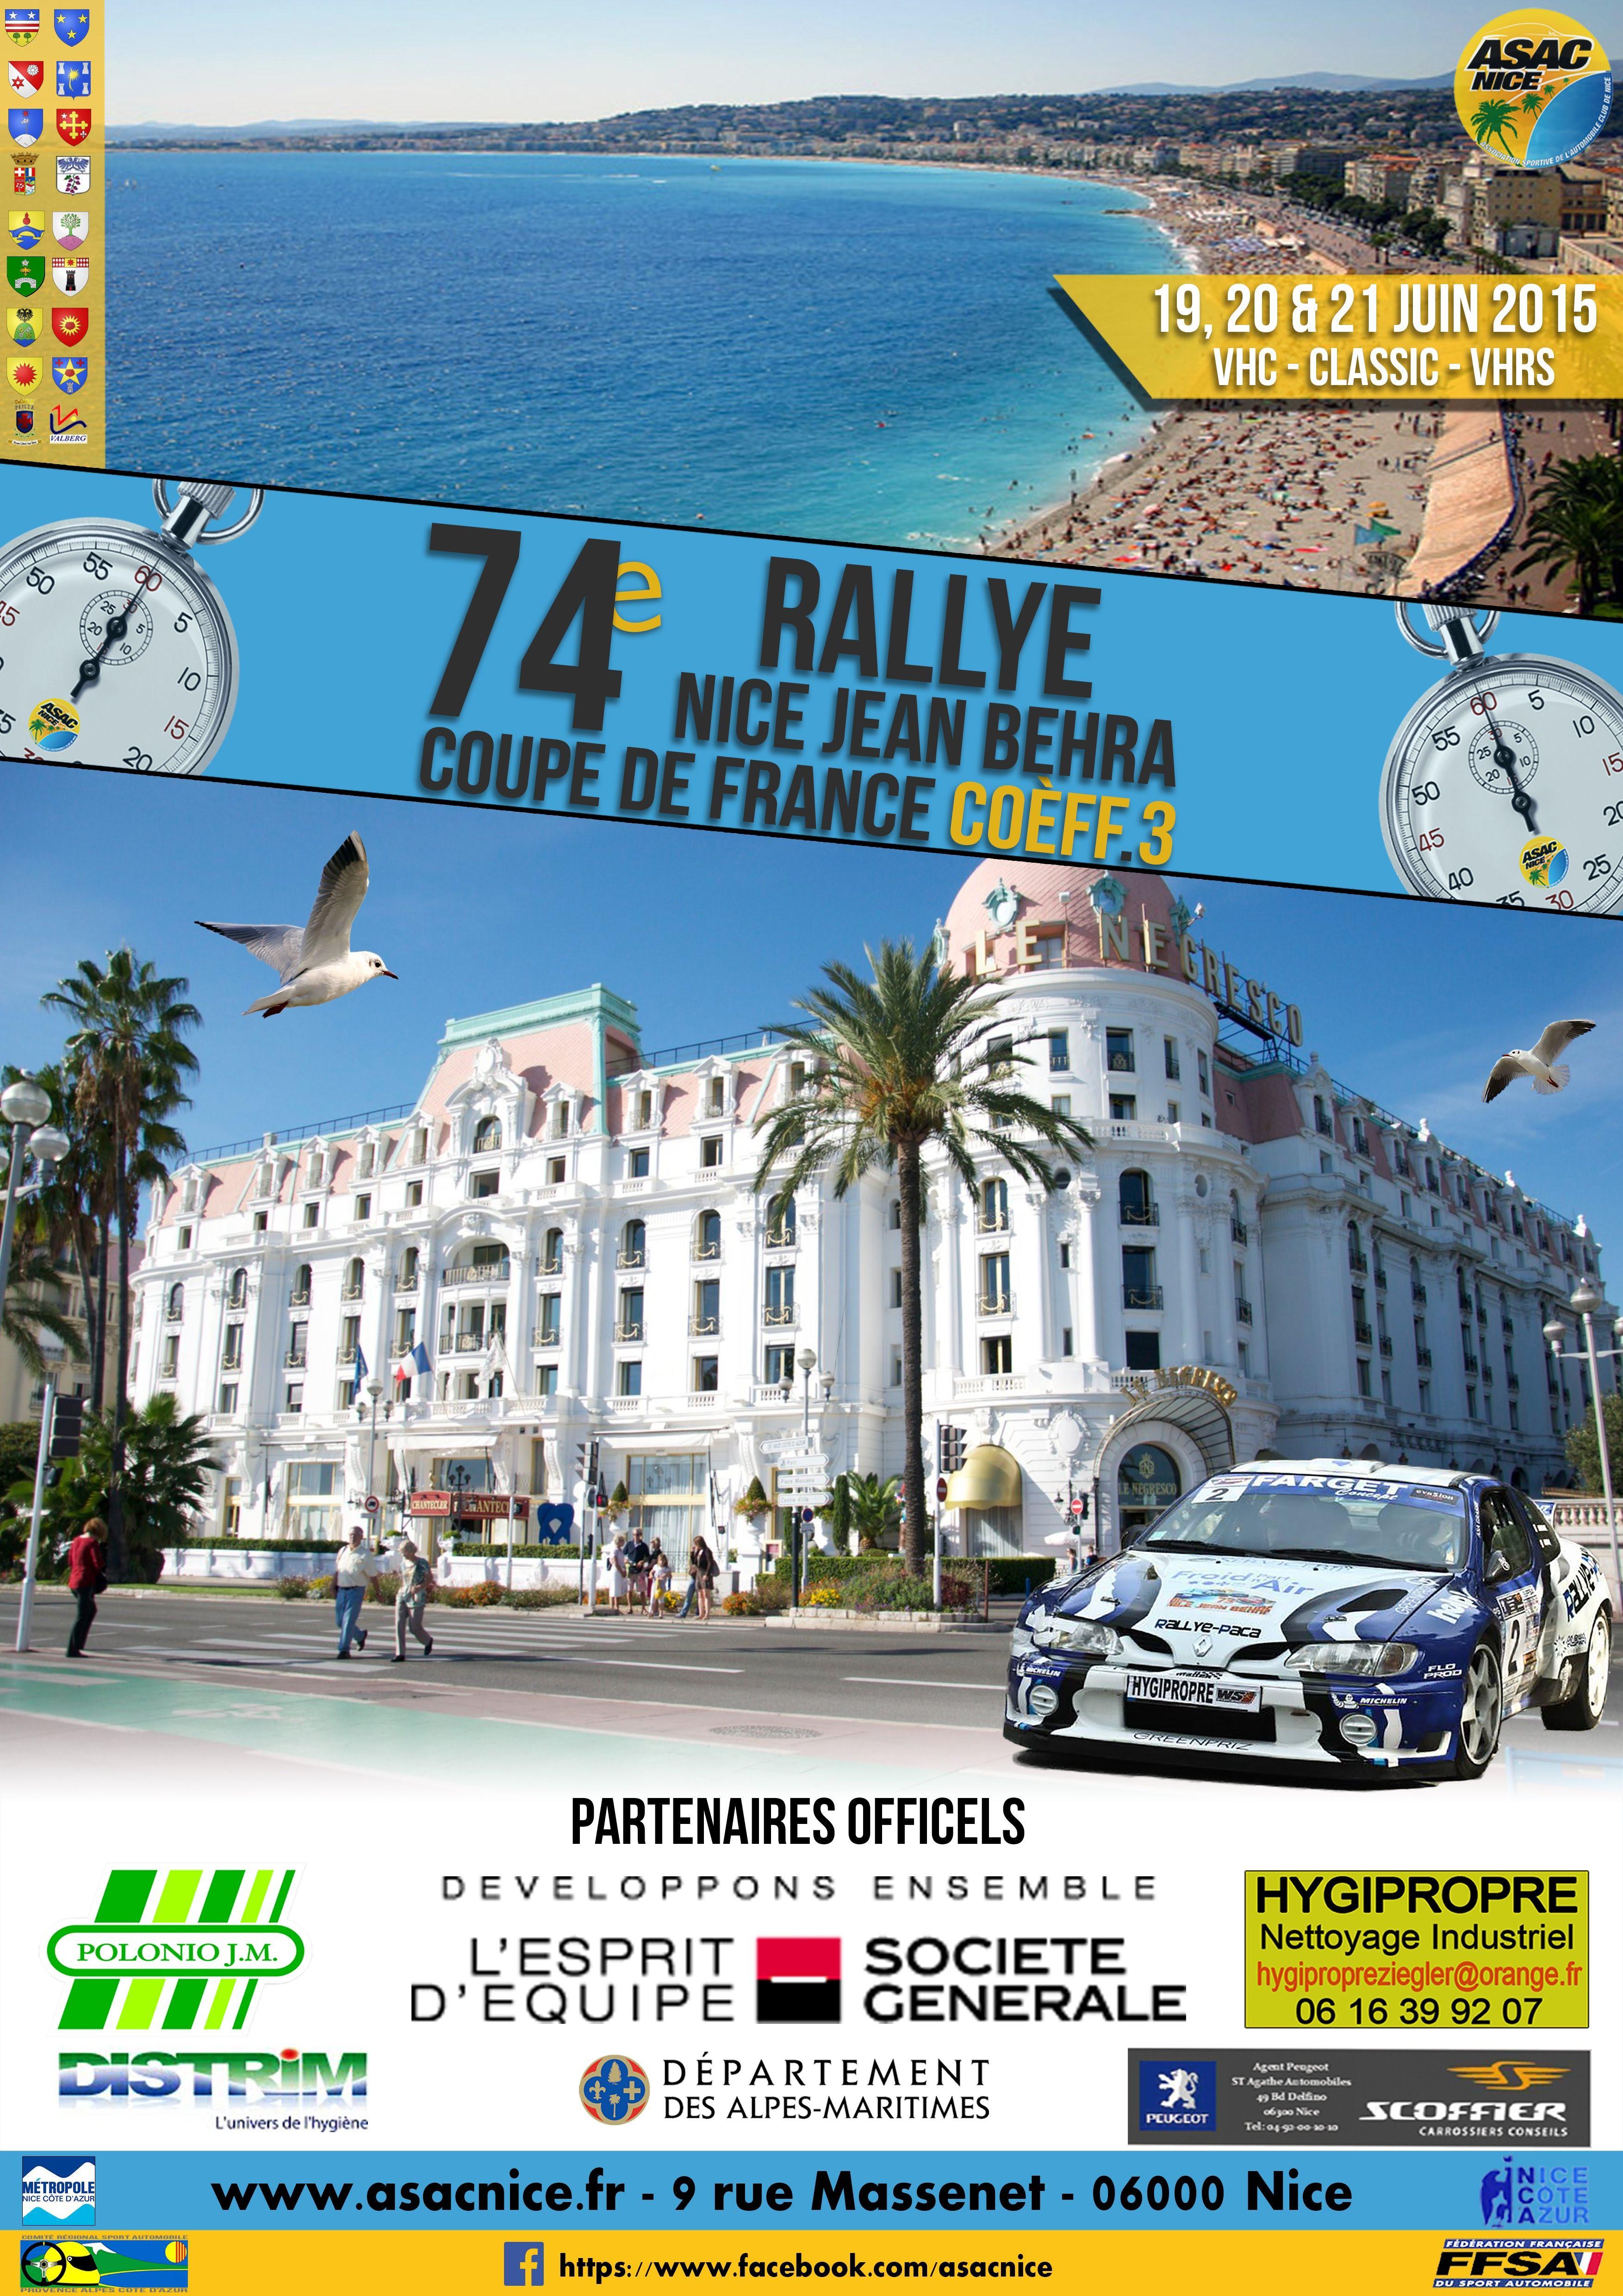 Classement-Direct-Rallye-Jean-Behra-2015